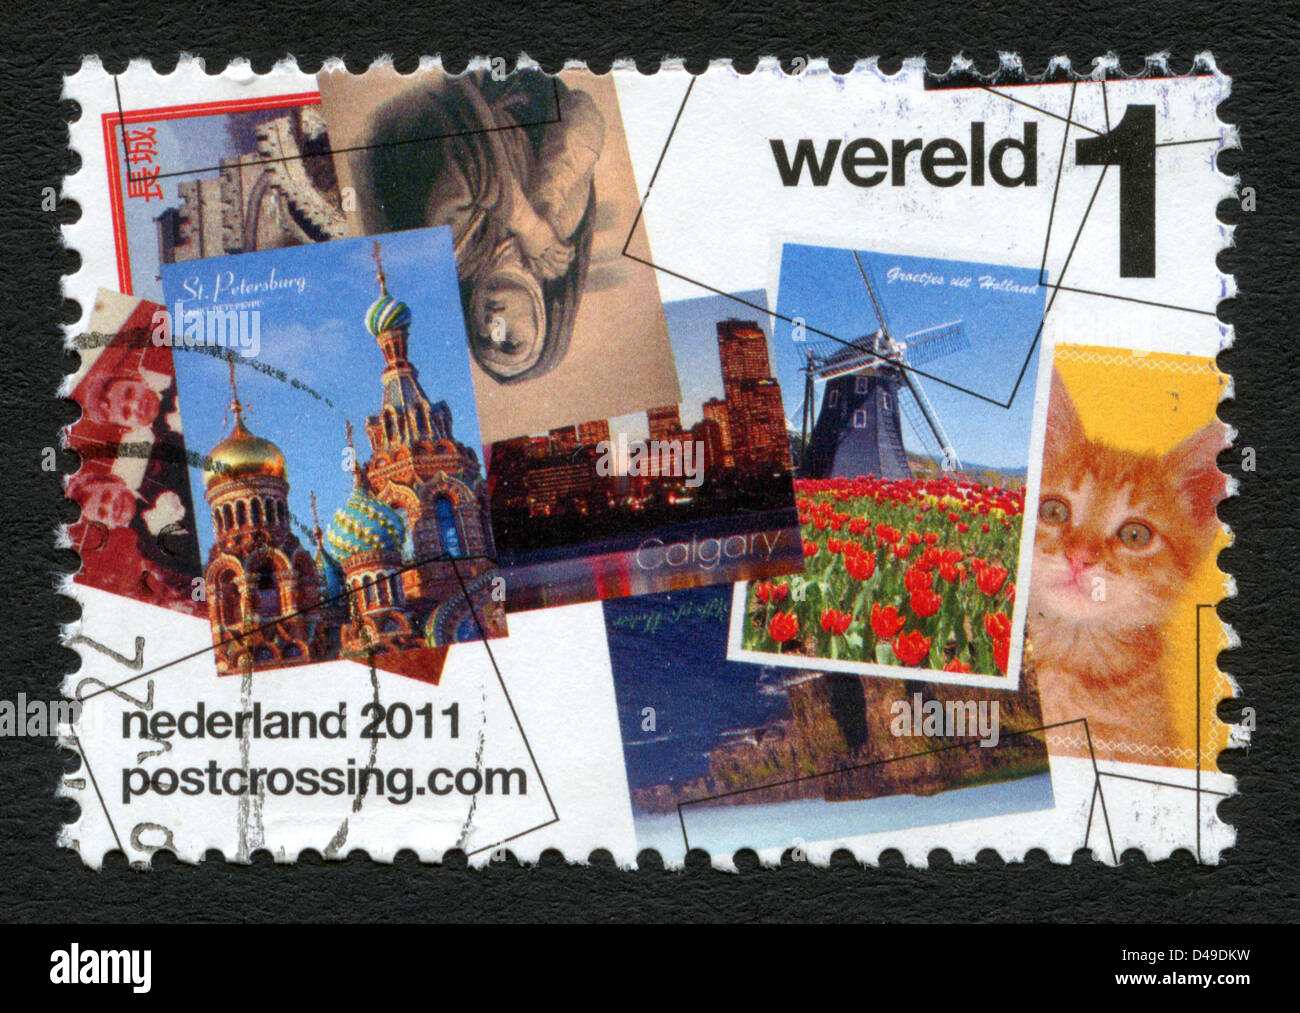 Netherlands postage stamp - Postcrossing postcard exchange - Stock Image